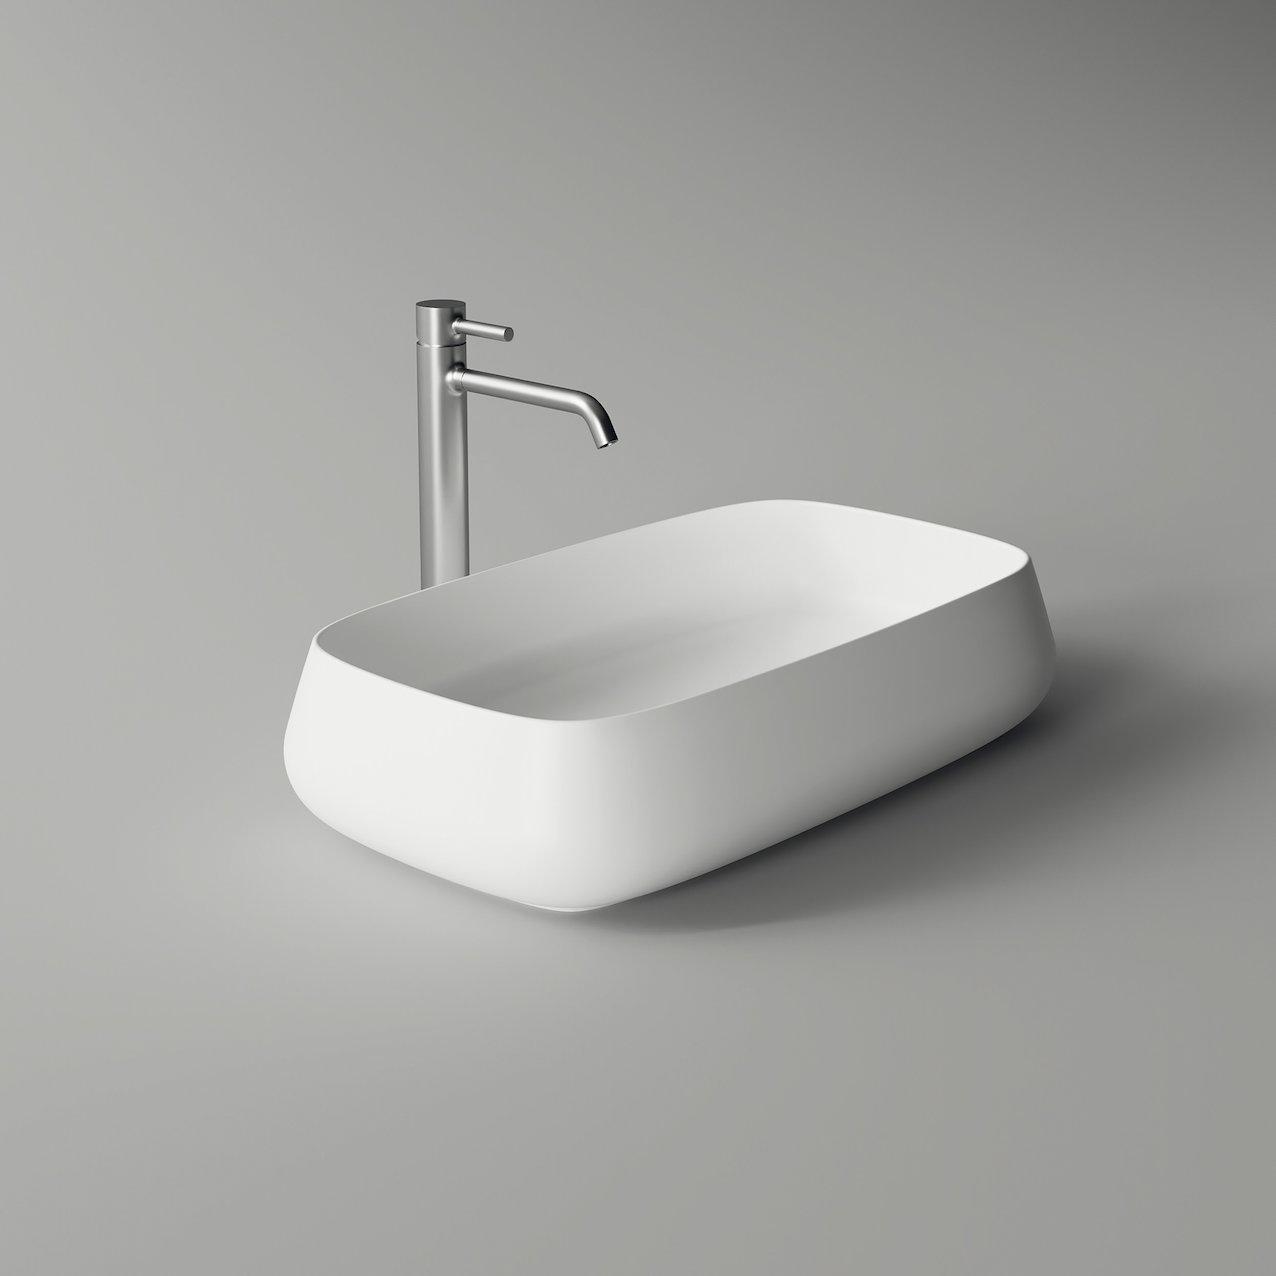 Lavabo NUR 60x35 cm